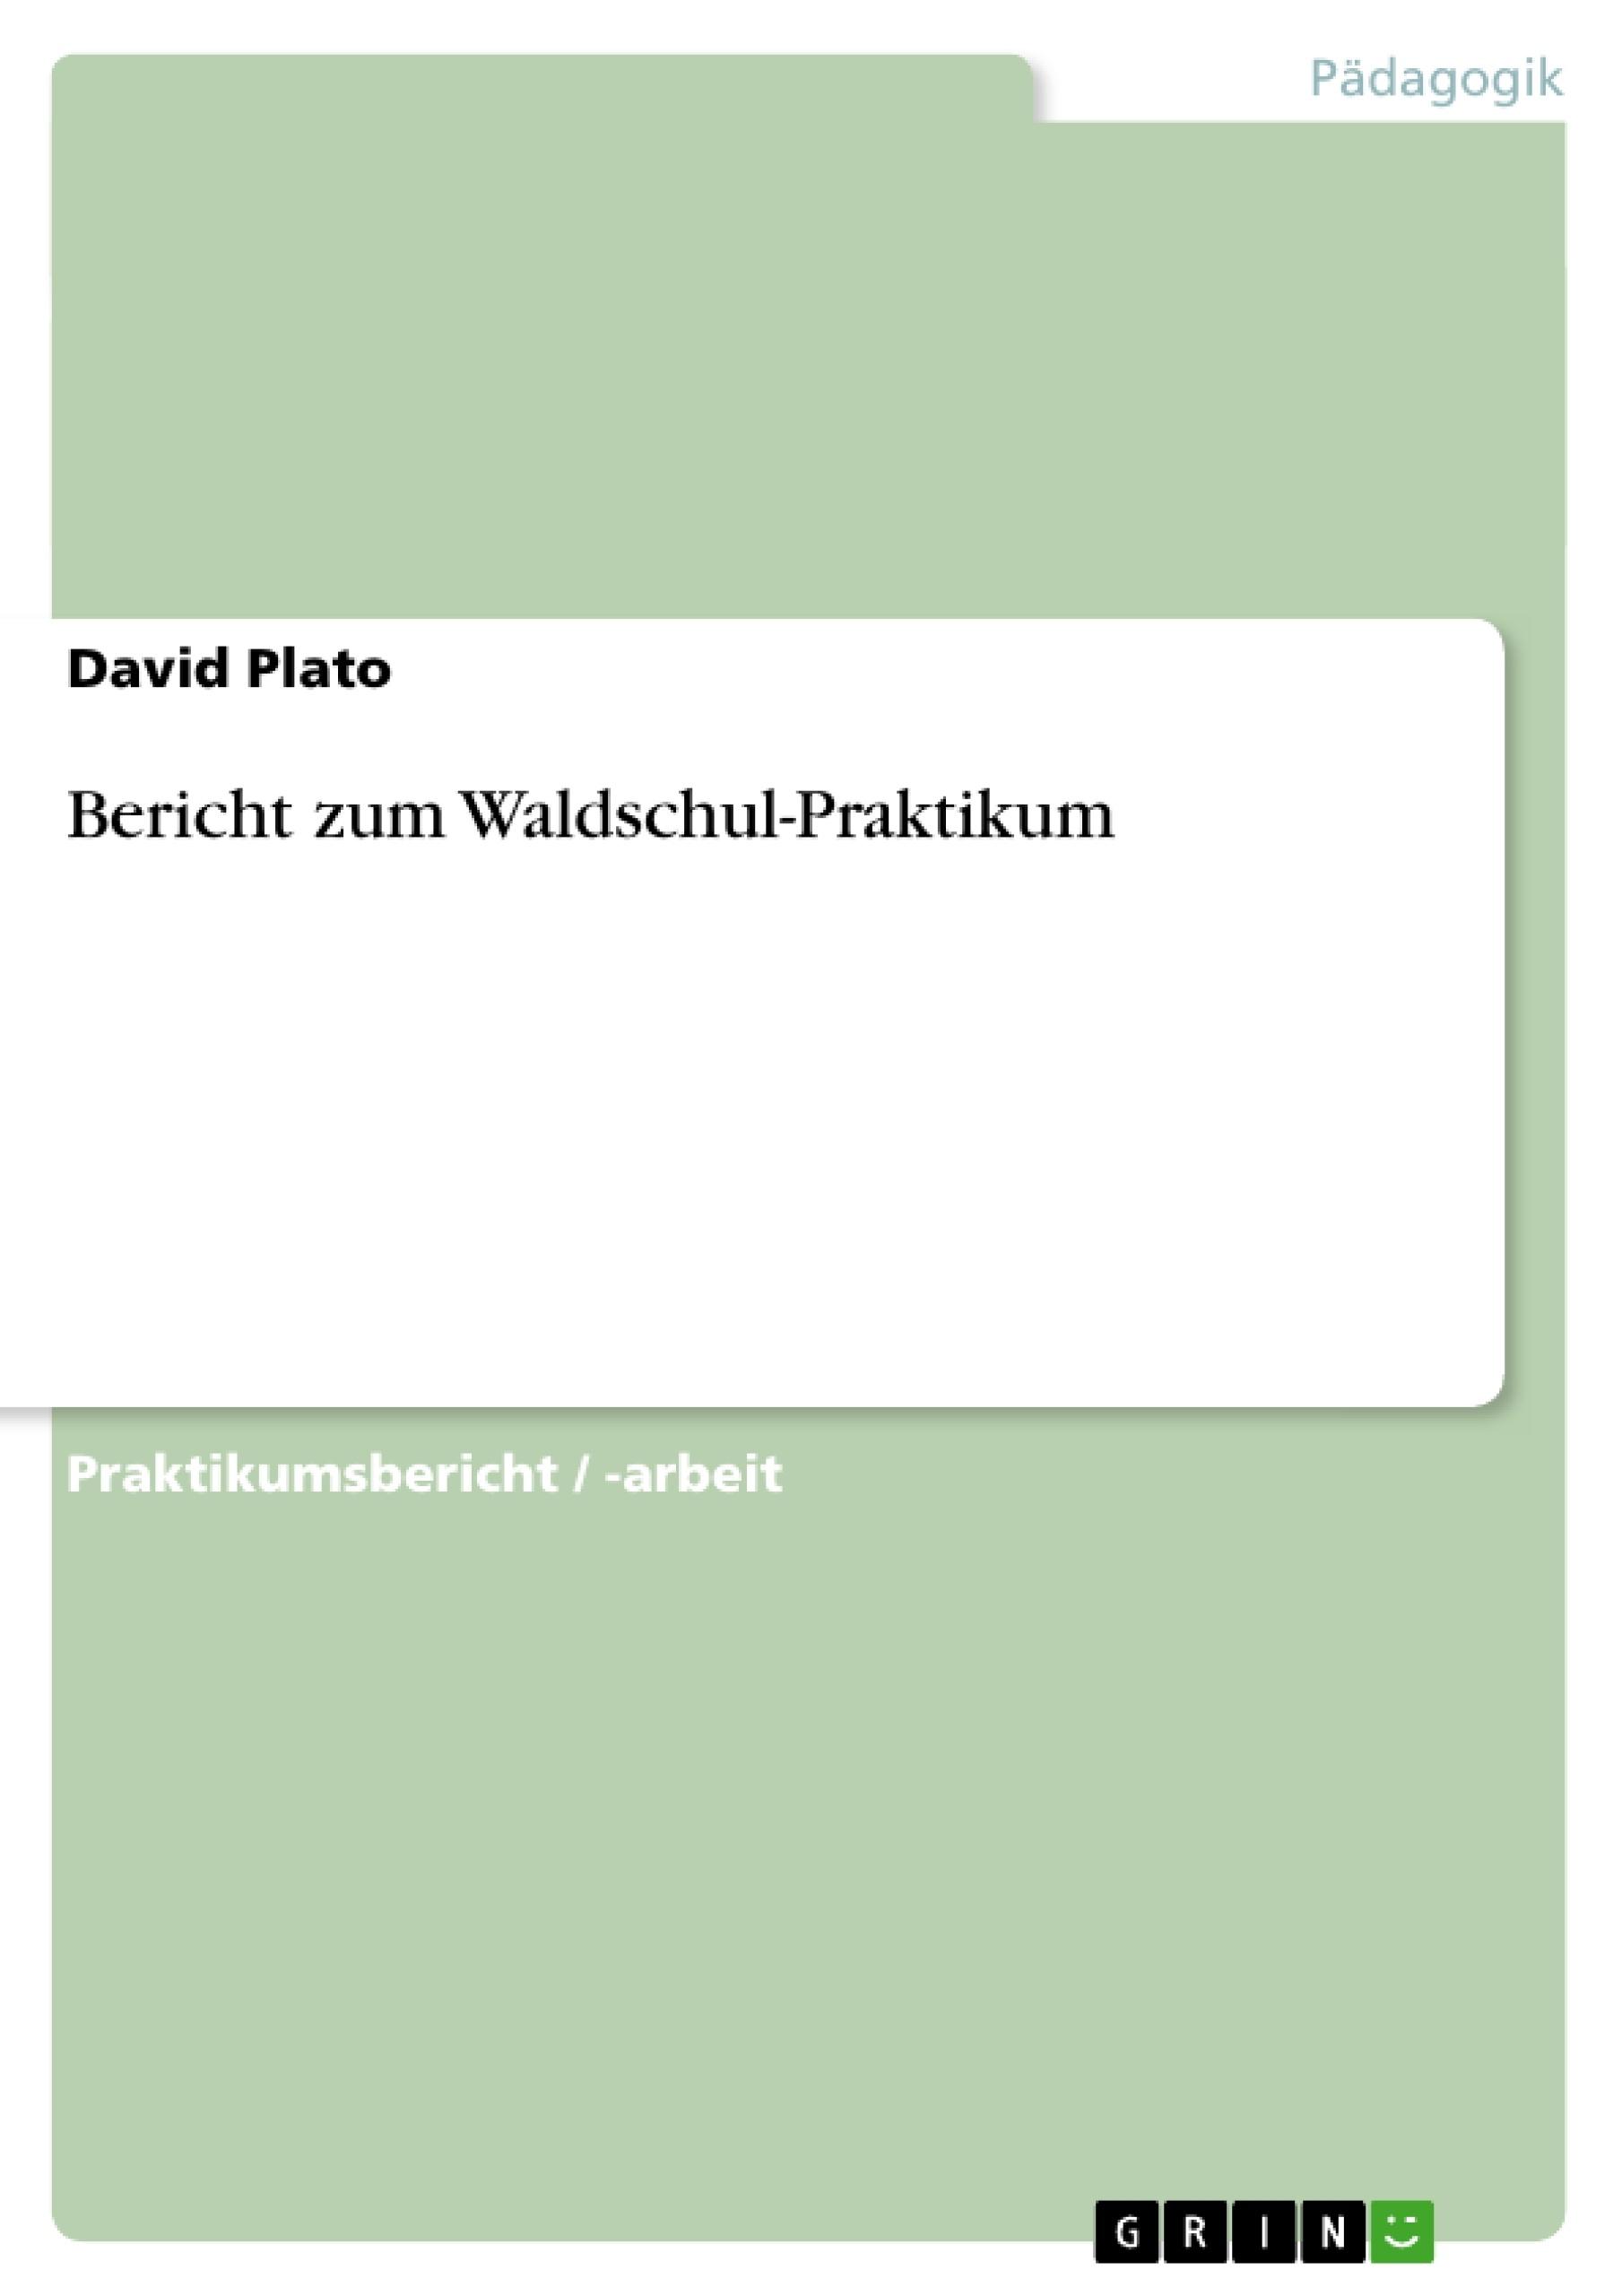 Titel: Bericht zum Waldschul-Praktikum